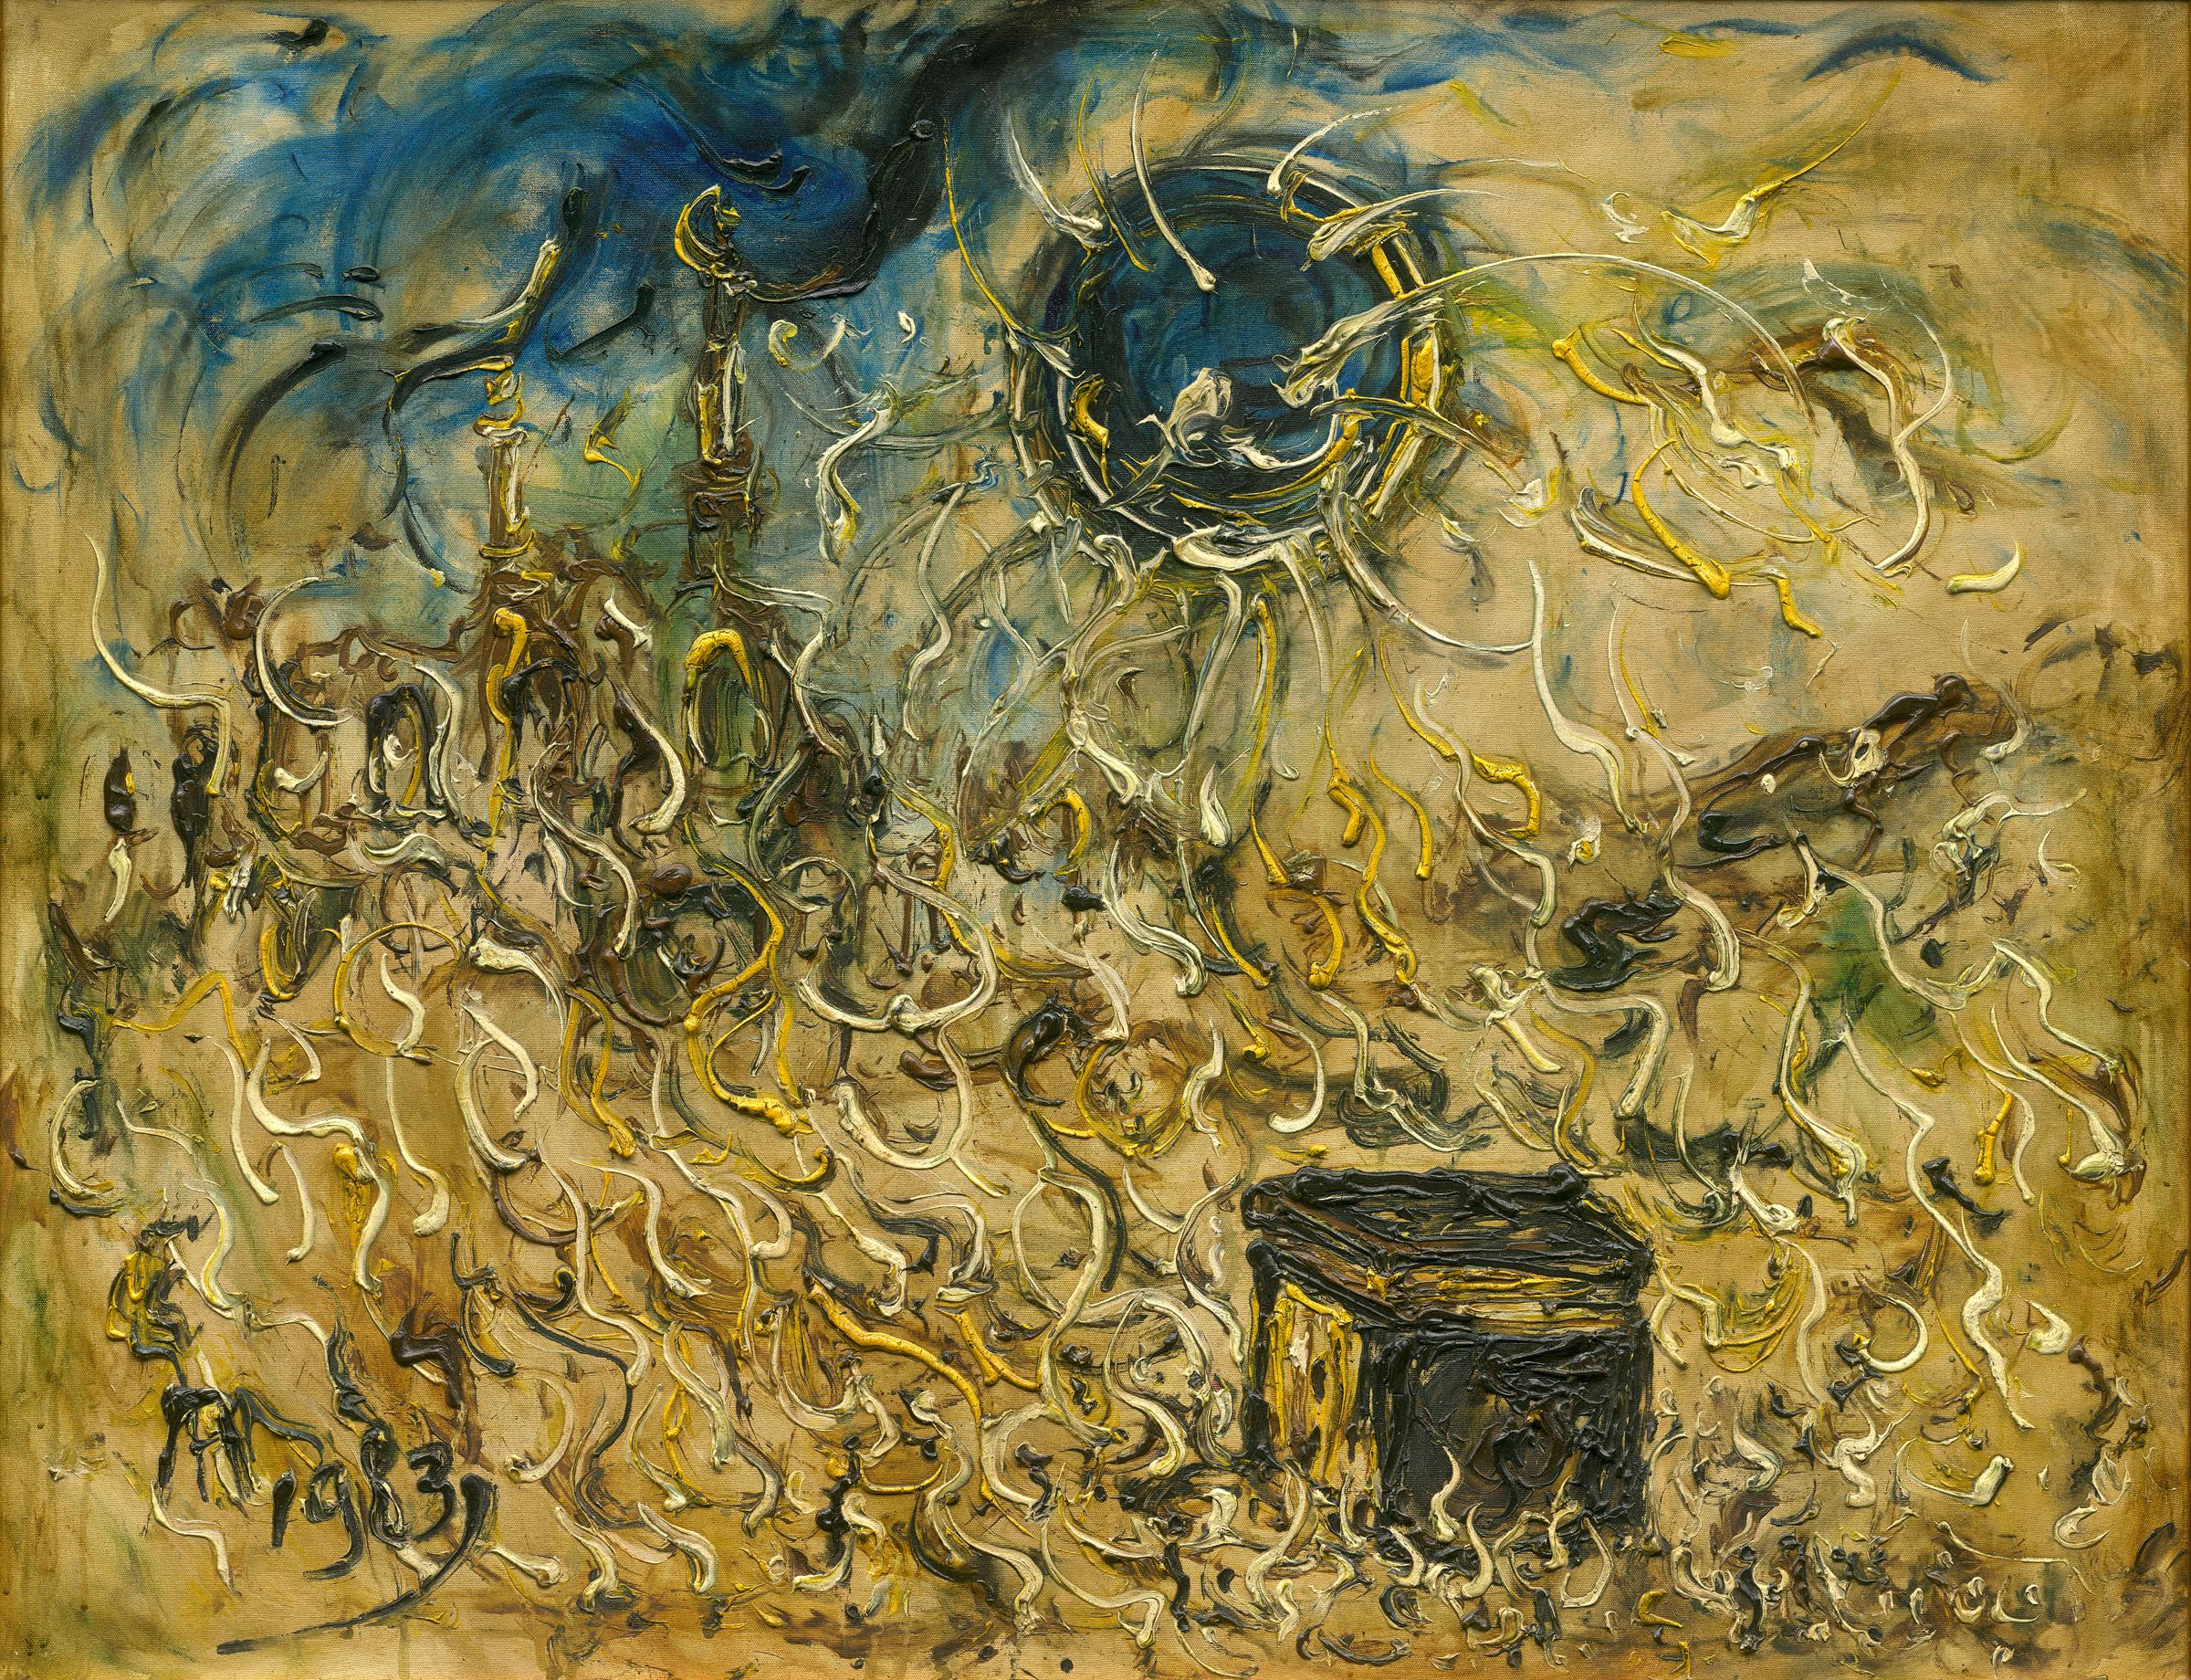 Affandi, Ka'abah, 1983, 100 x 125 cm